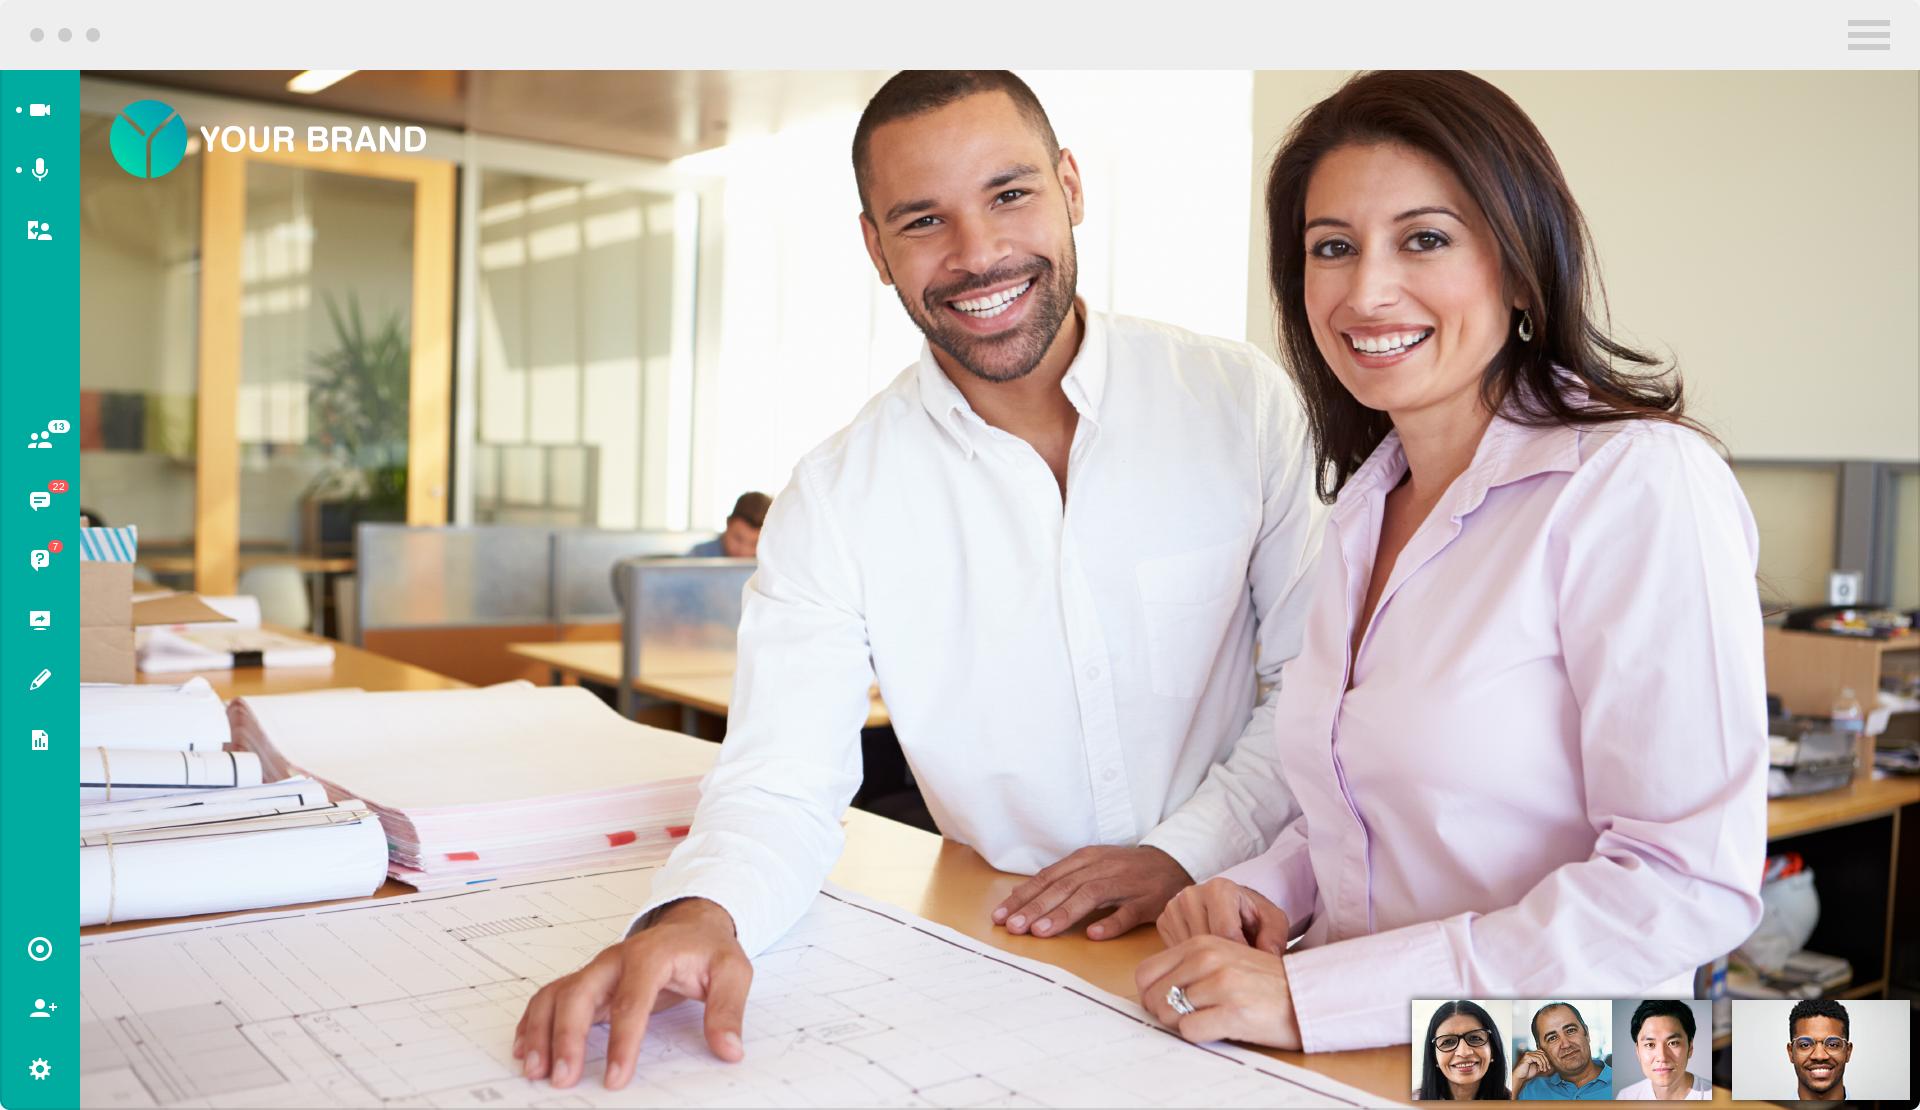 Rebrand your webinars and meetings